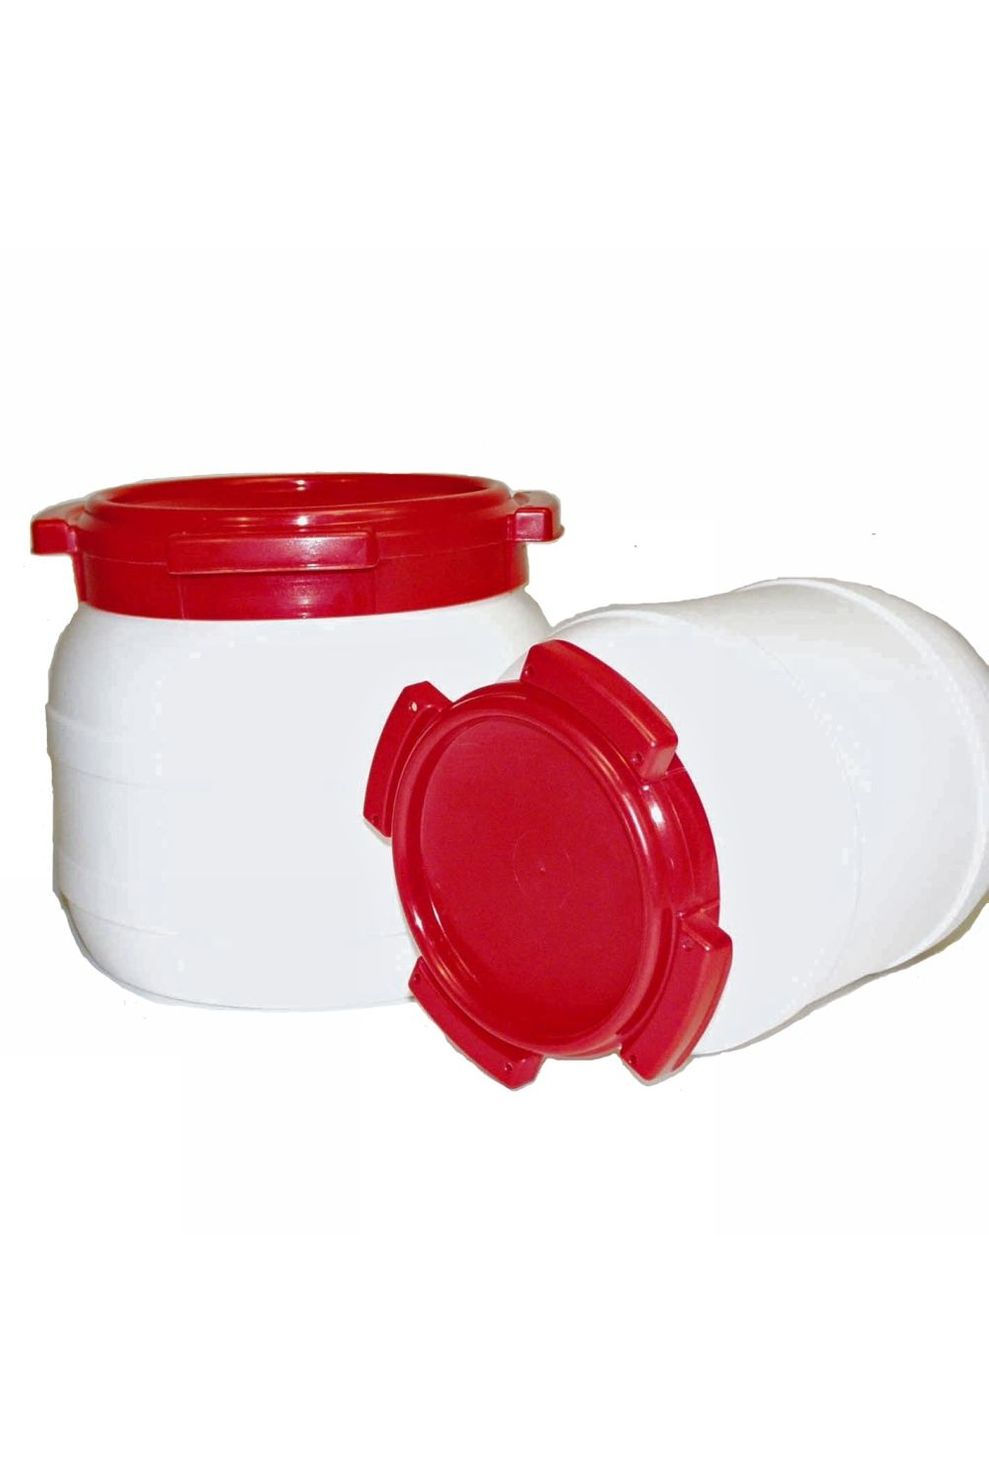 No Label Watervat 6,4 l - Transparant/Transparant